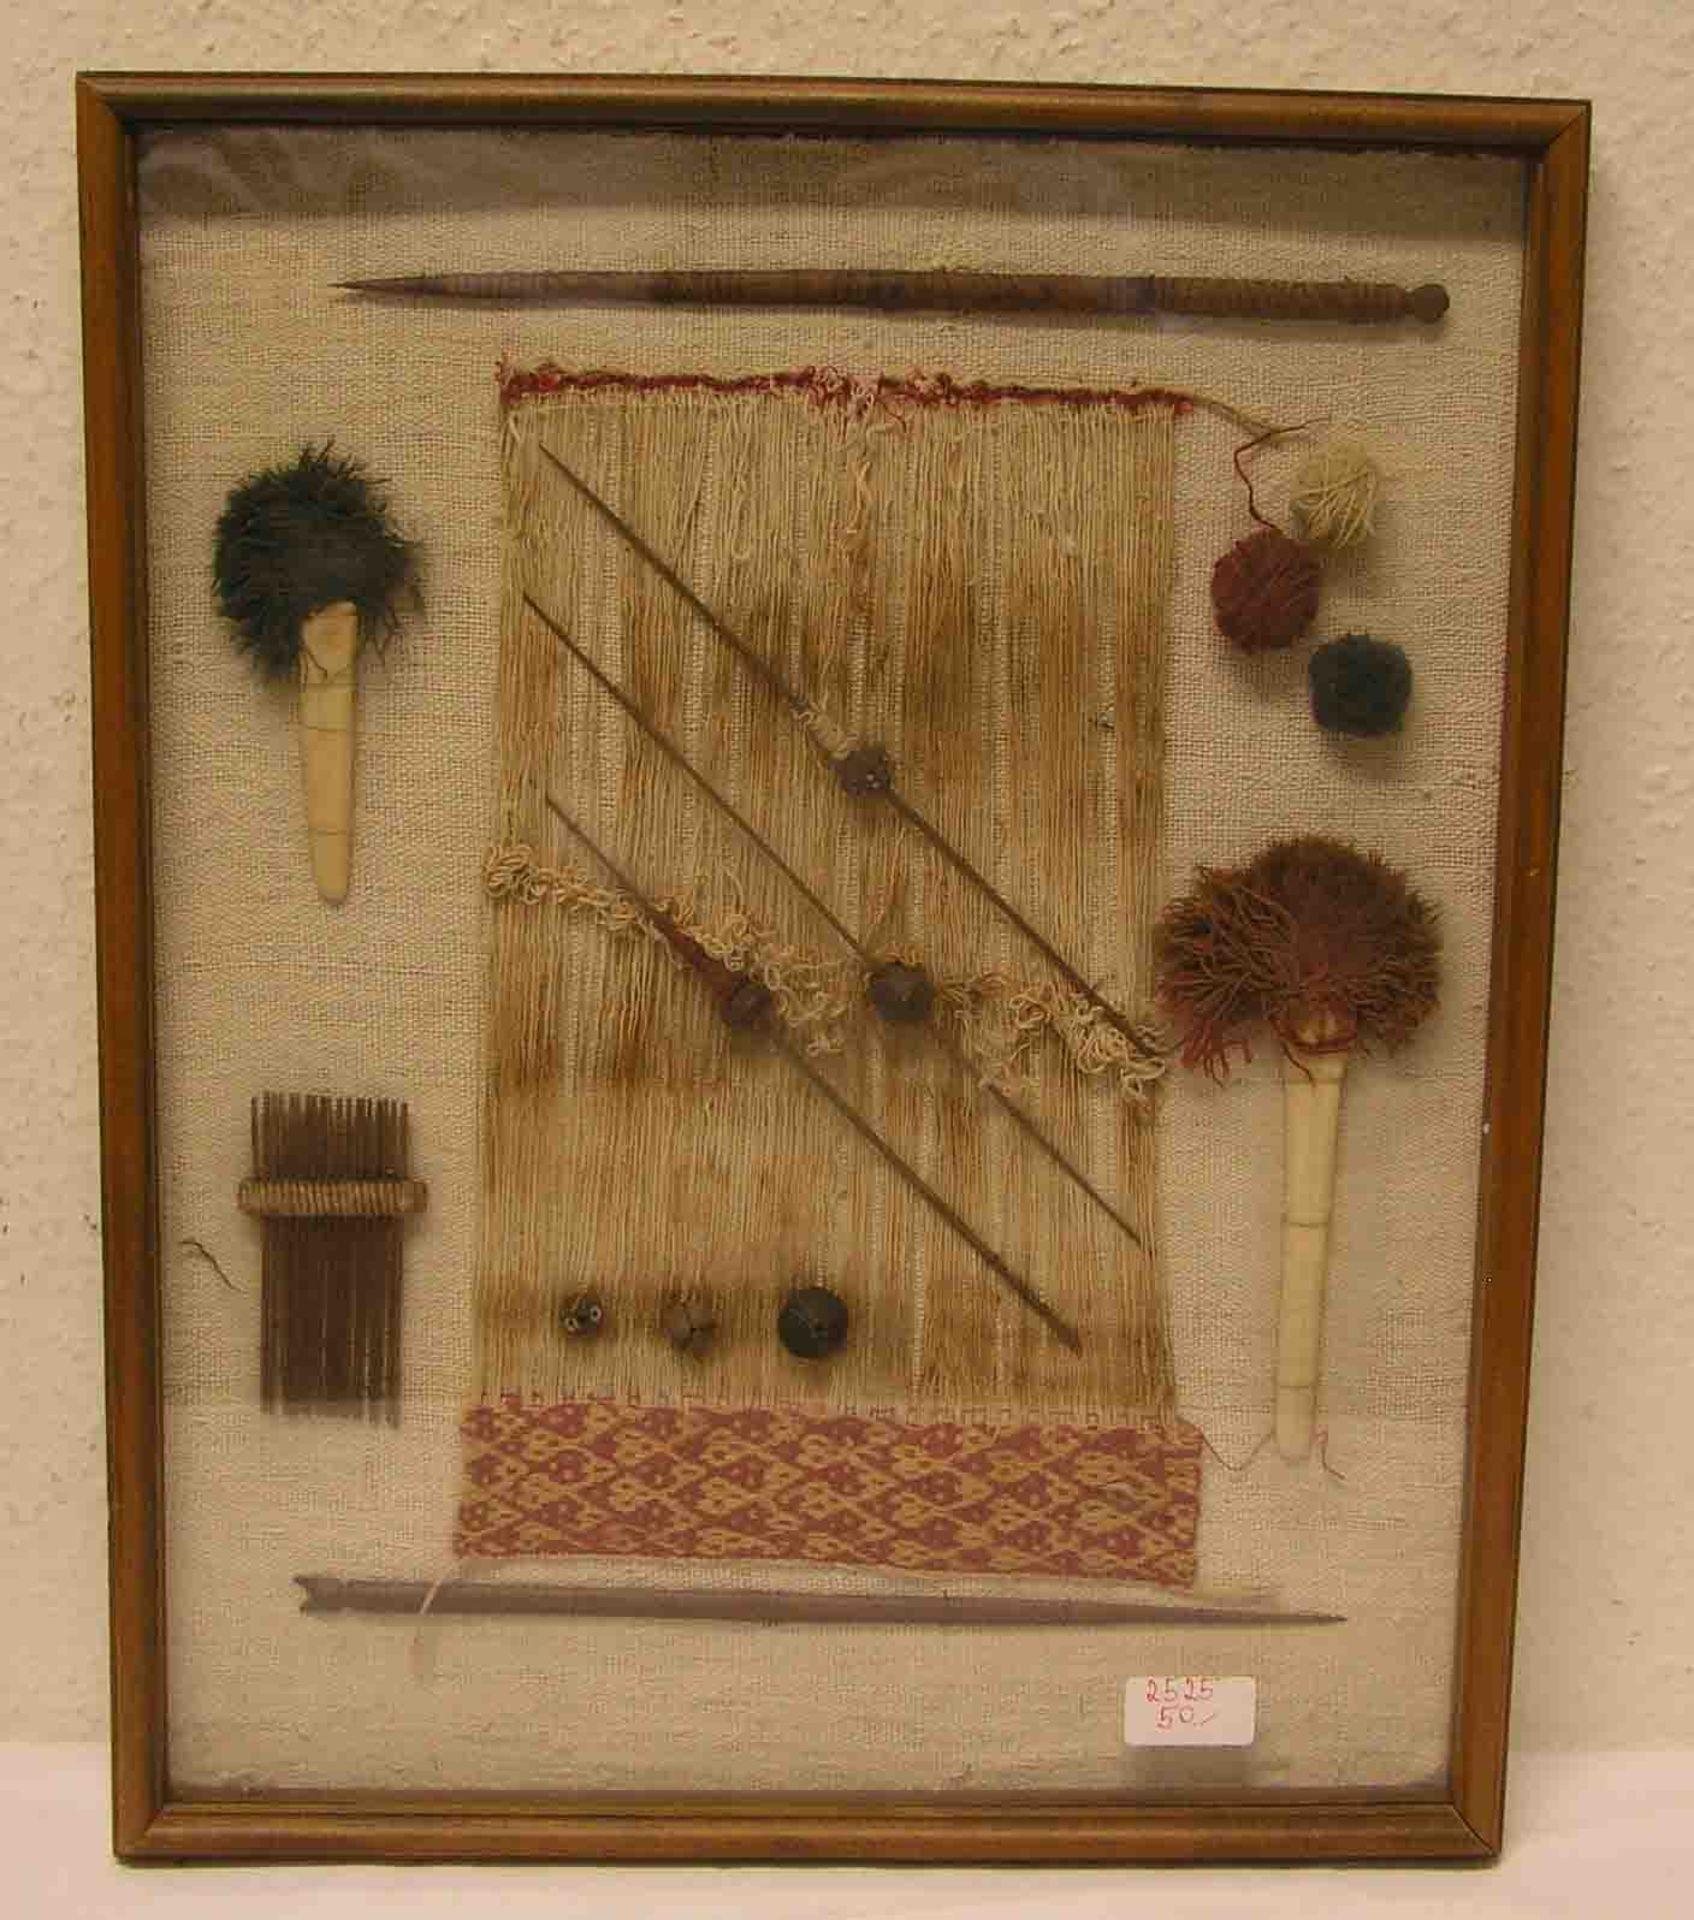 Inka - Textilarbeit. Im Rahmen mit